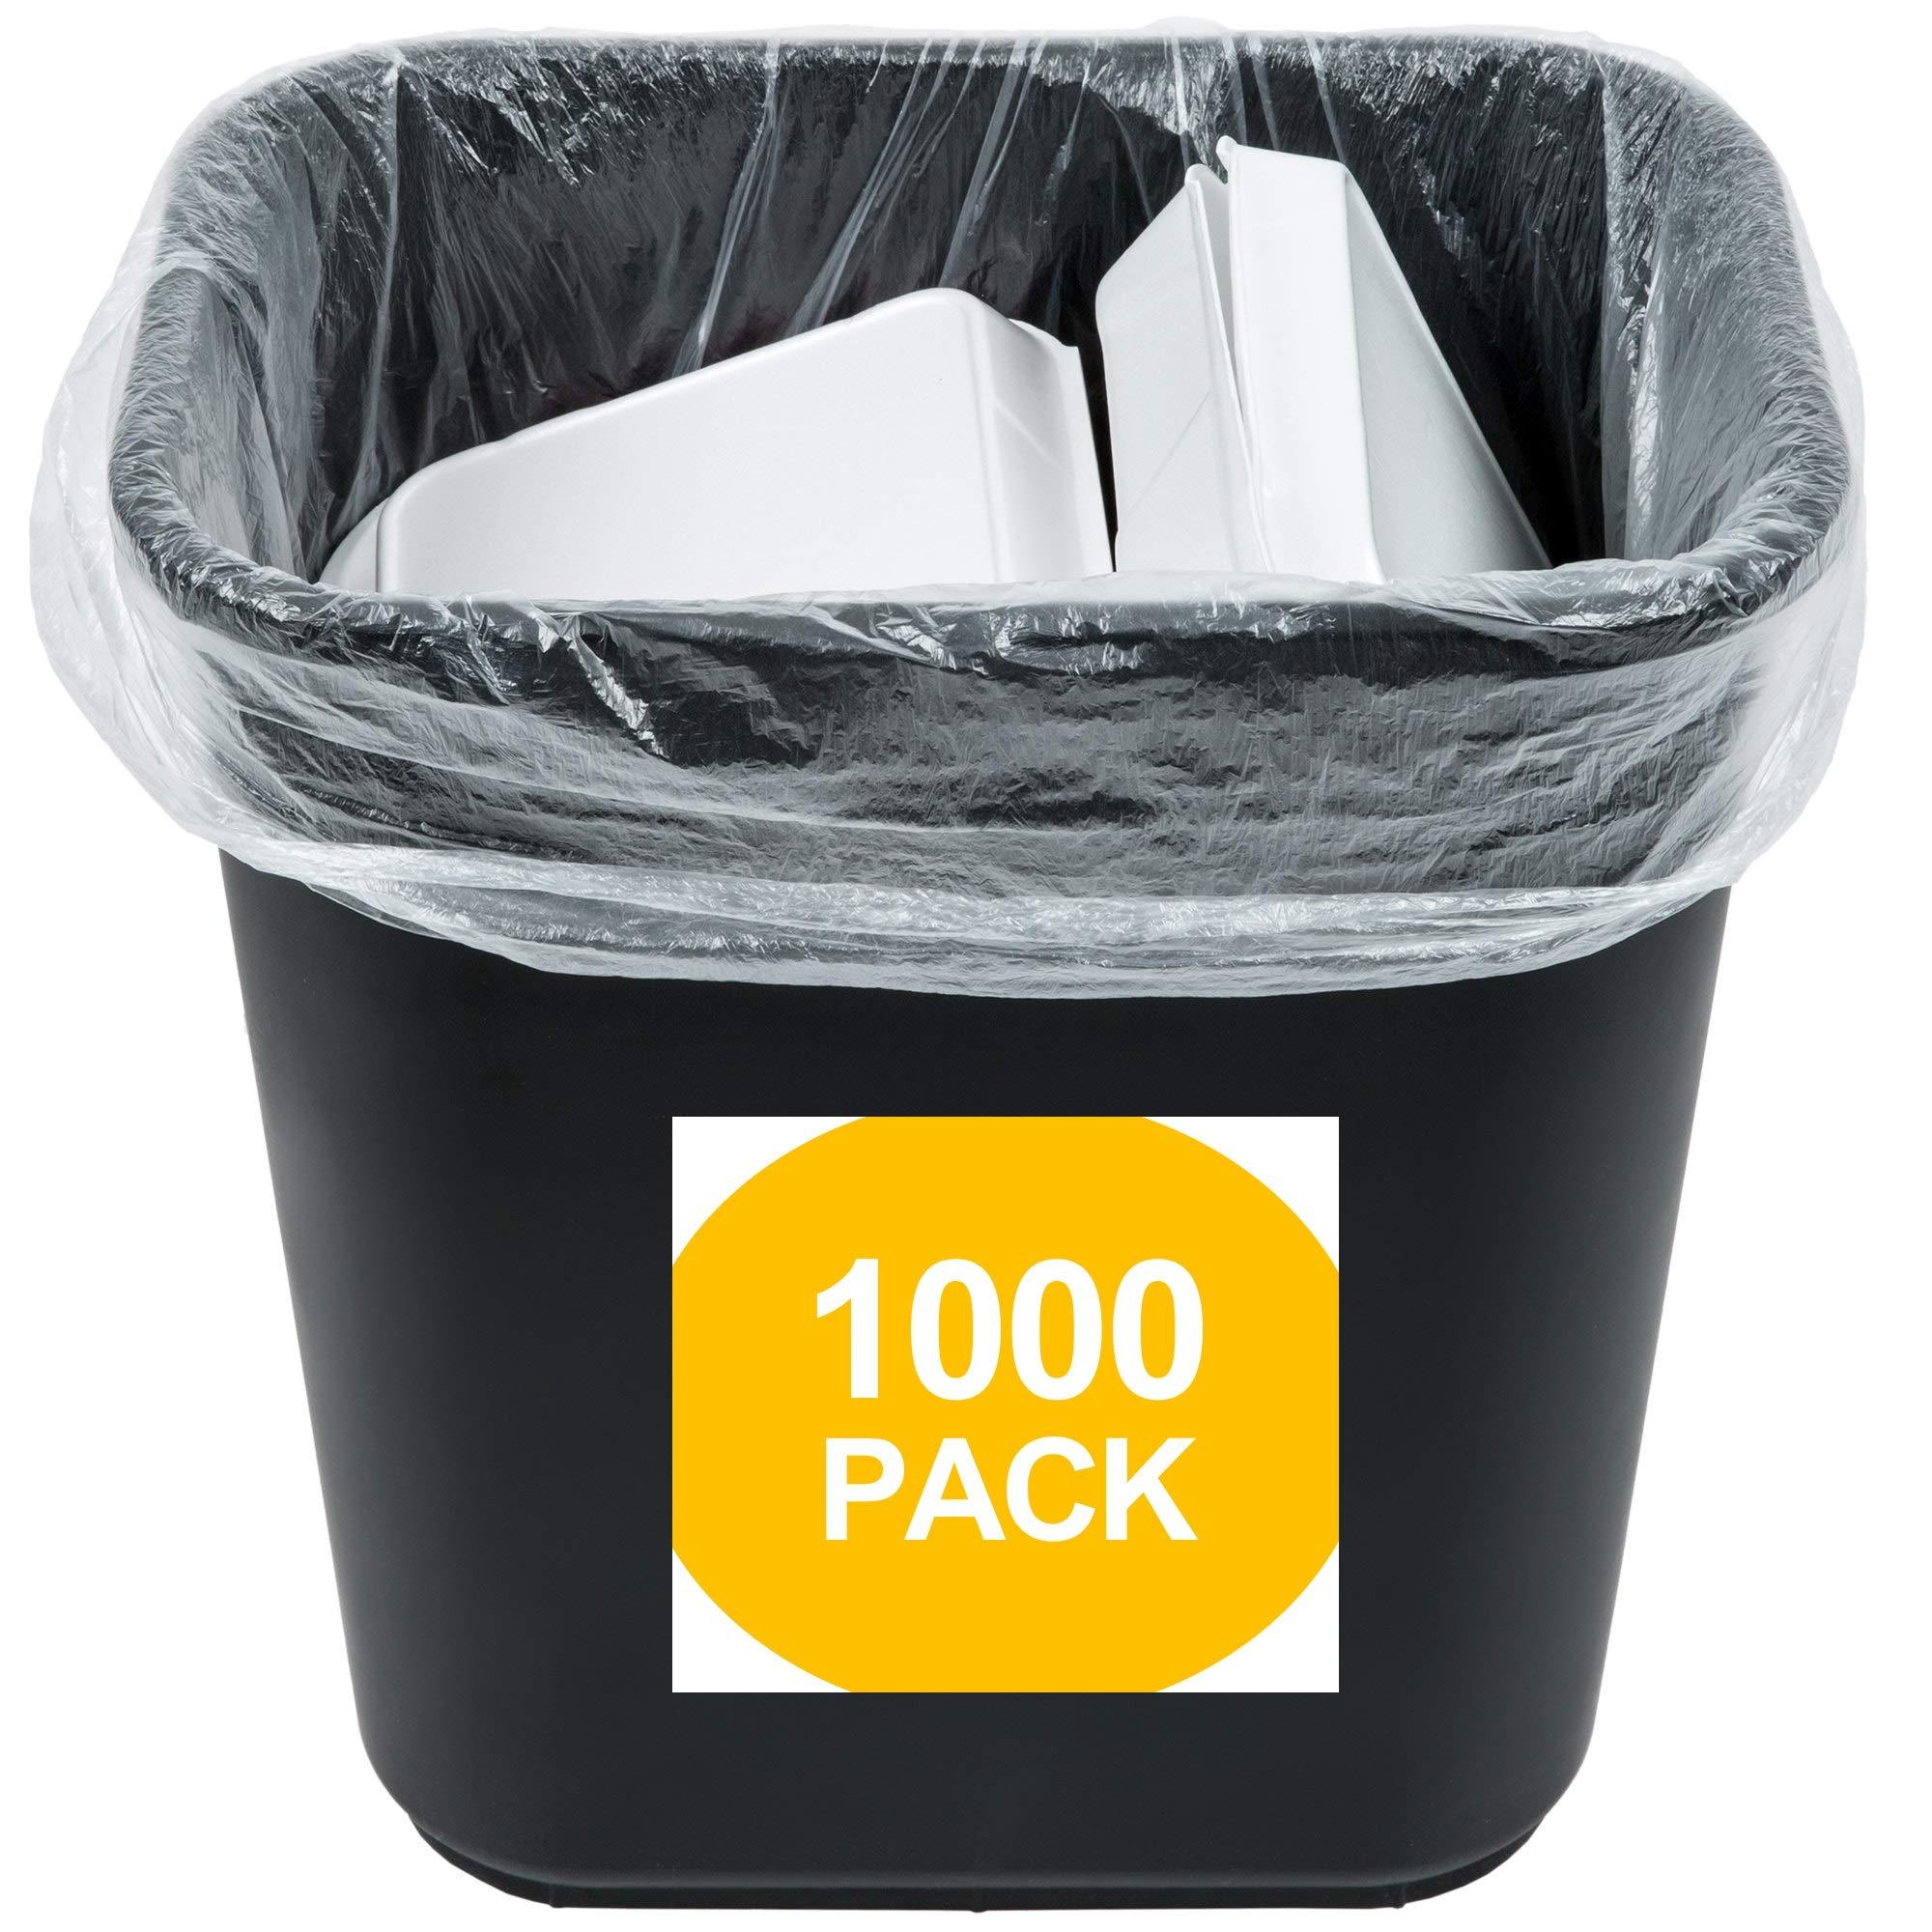 1000 Small to Medium Trash Bags | 7-8-9-10 Gallon Trash Bags | 24'' x 24'' Clear Garbage Bags - Commercial Waste Basket Trash Bags | Bulk Plastic Bathroom Trash Can Liners | Office Shredder Bags by Leano Line